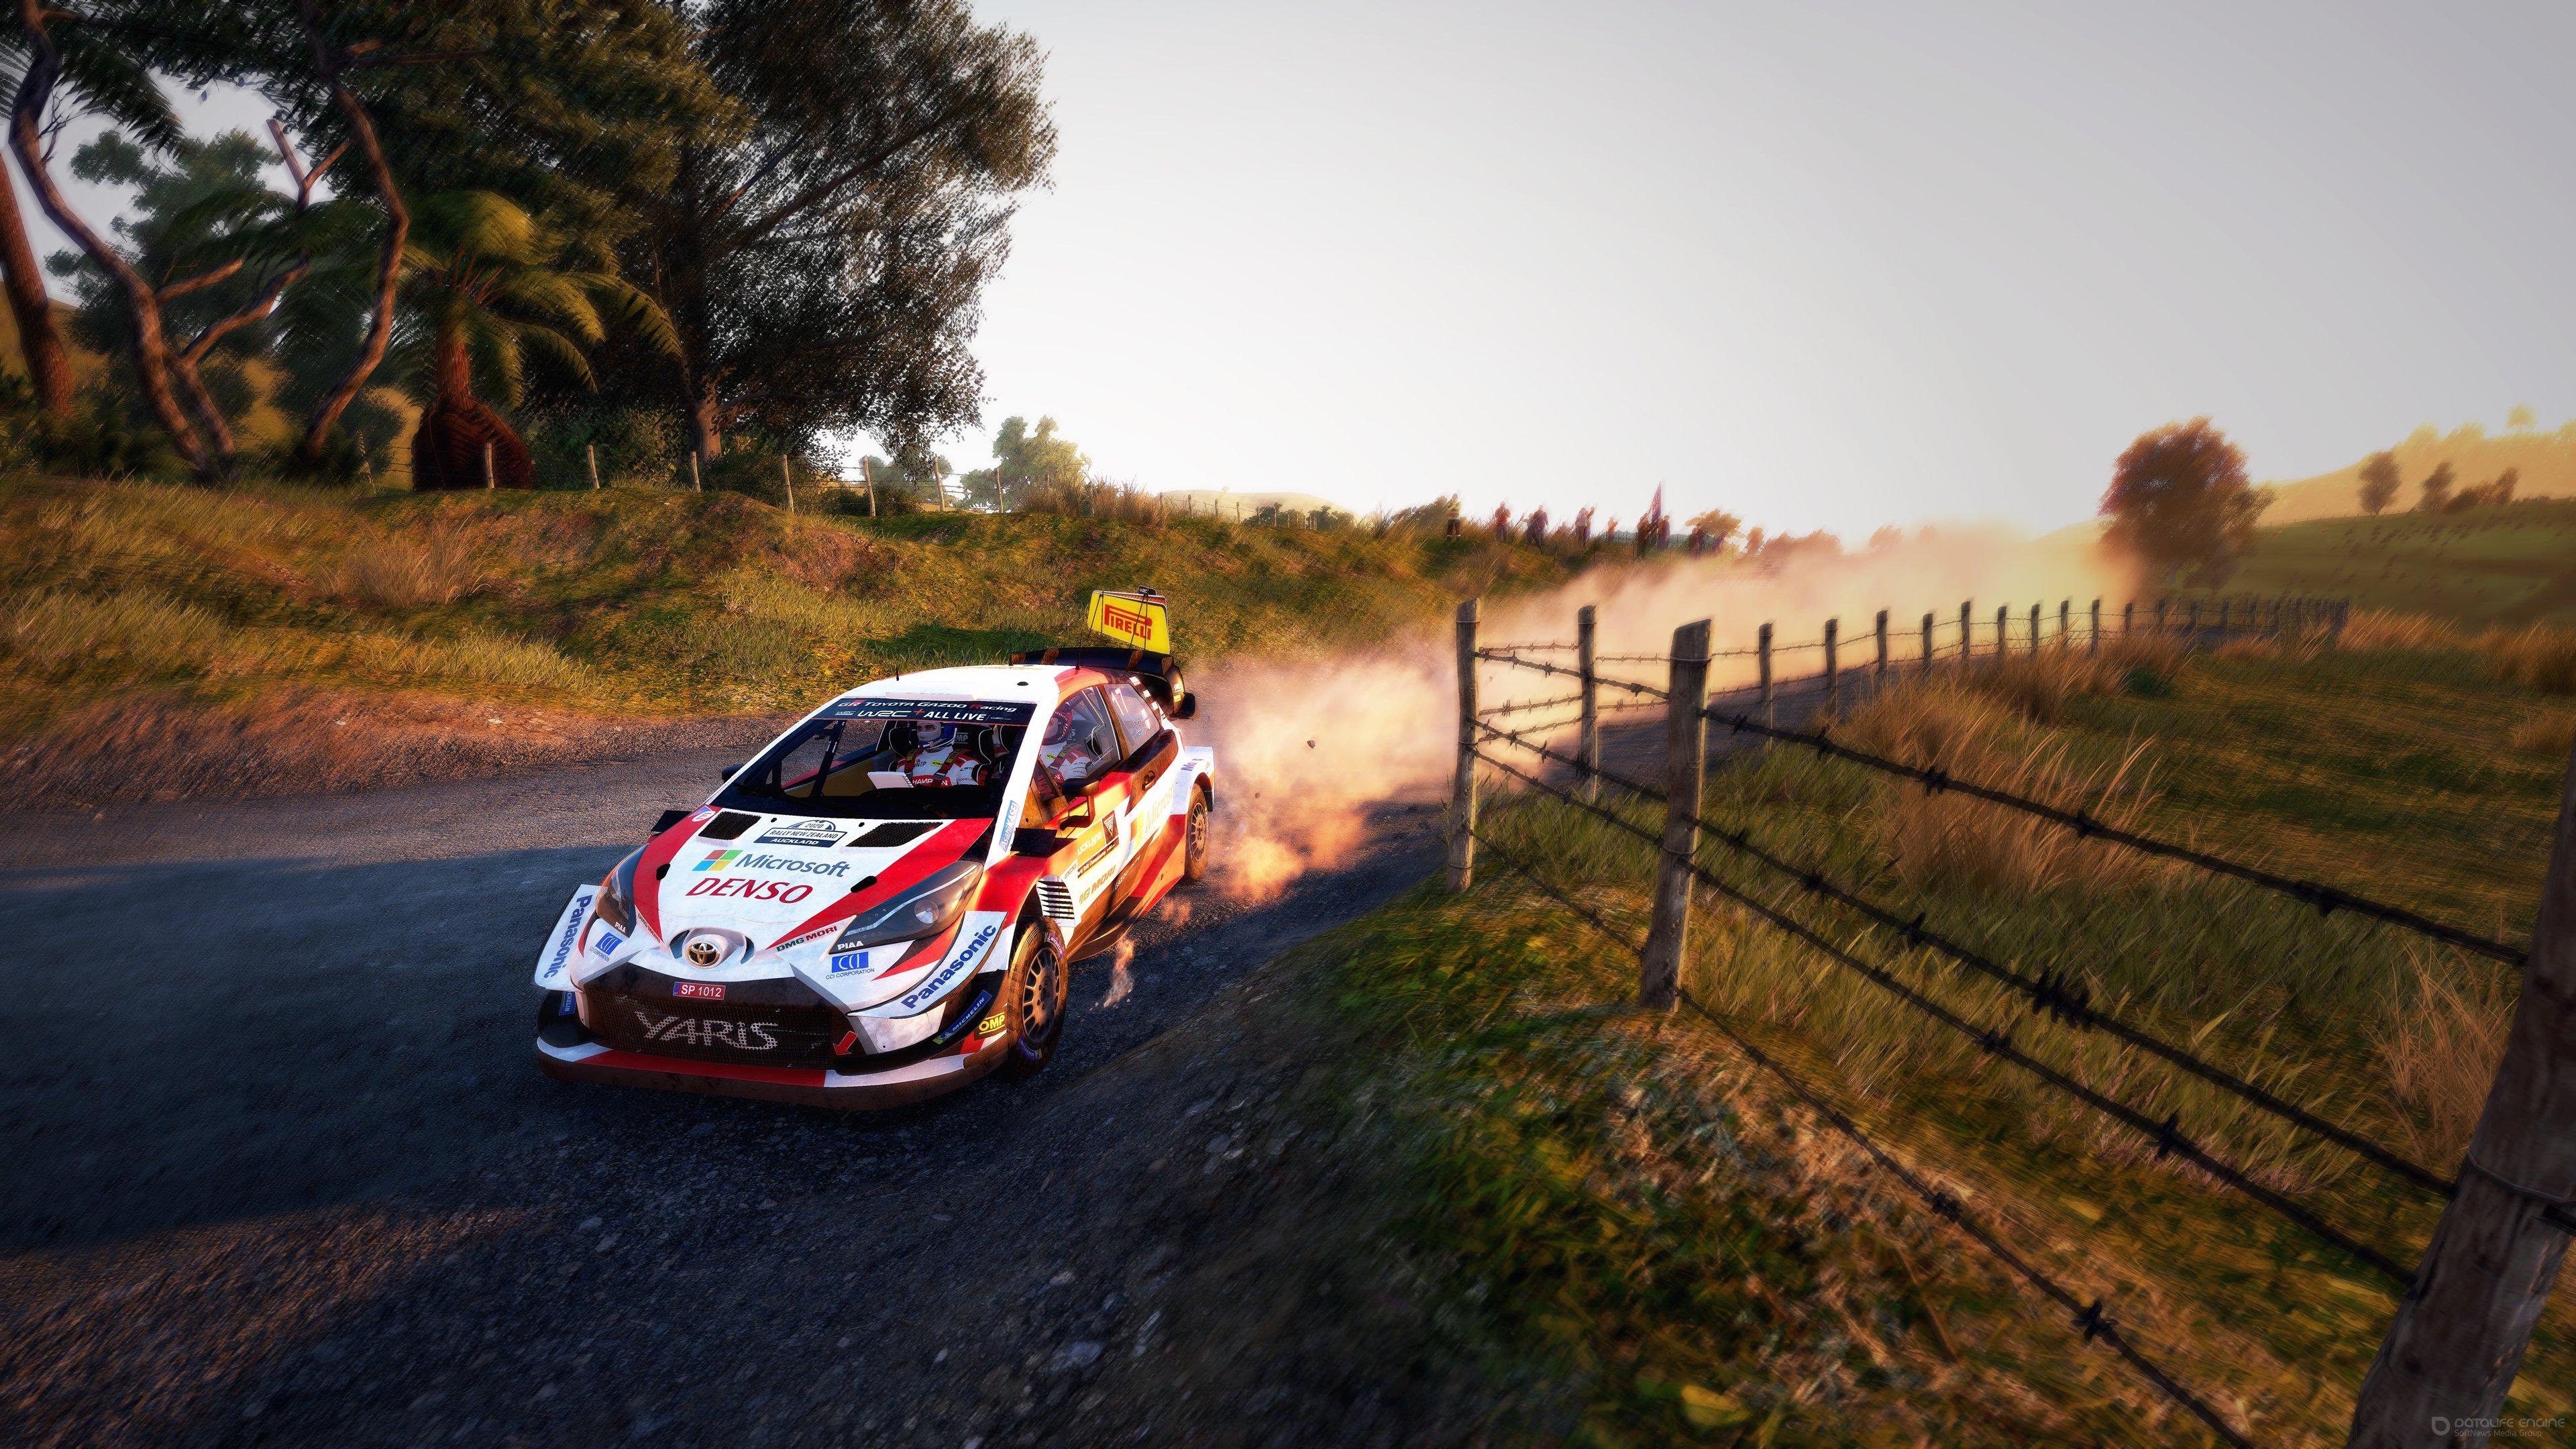 Скриншот к игре WRC 9 FIA World Rally Championship : Deluxe Edition [v 1.0 Update 2 + DLCs] (2020) скачать торрент RePack